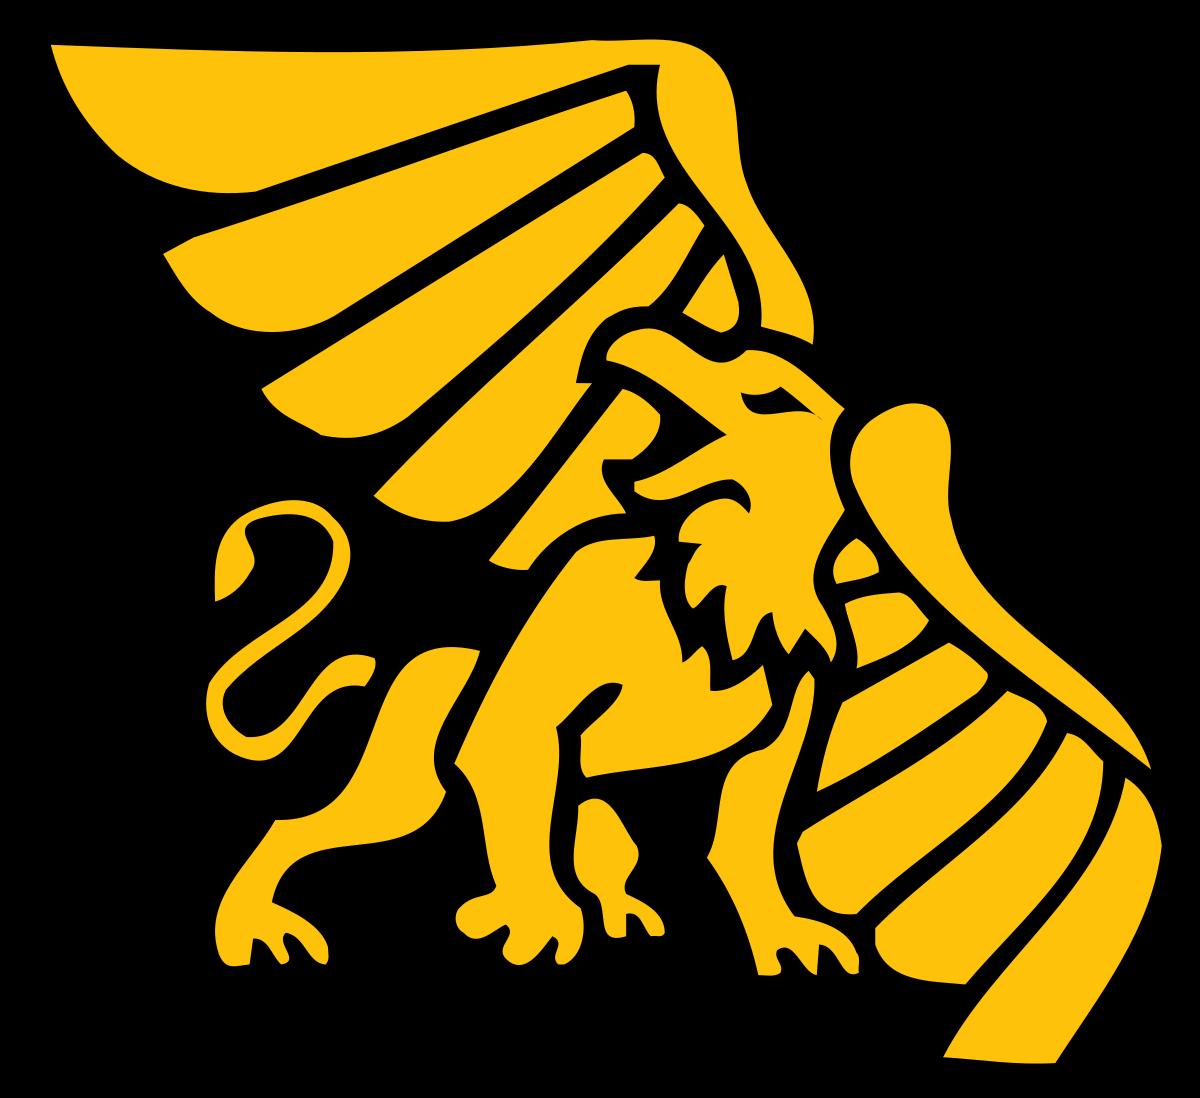 Pin by Tilden Jones on Sports Logos Missouri western